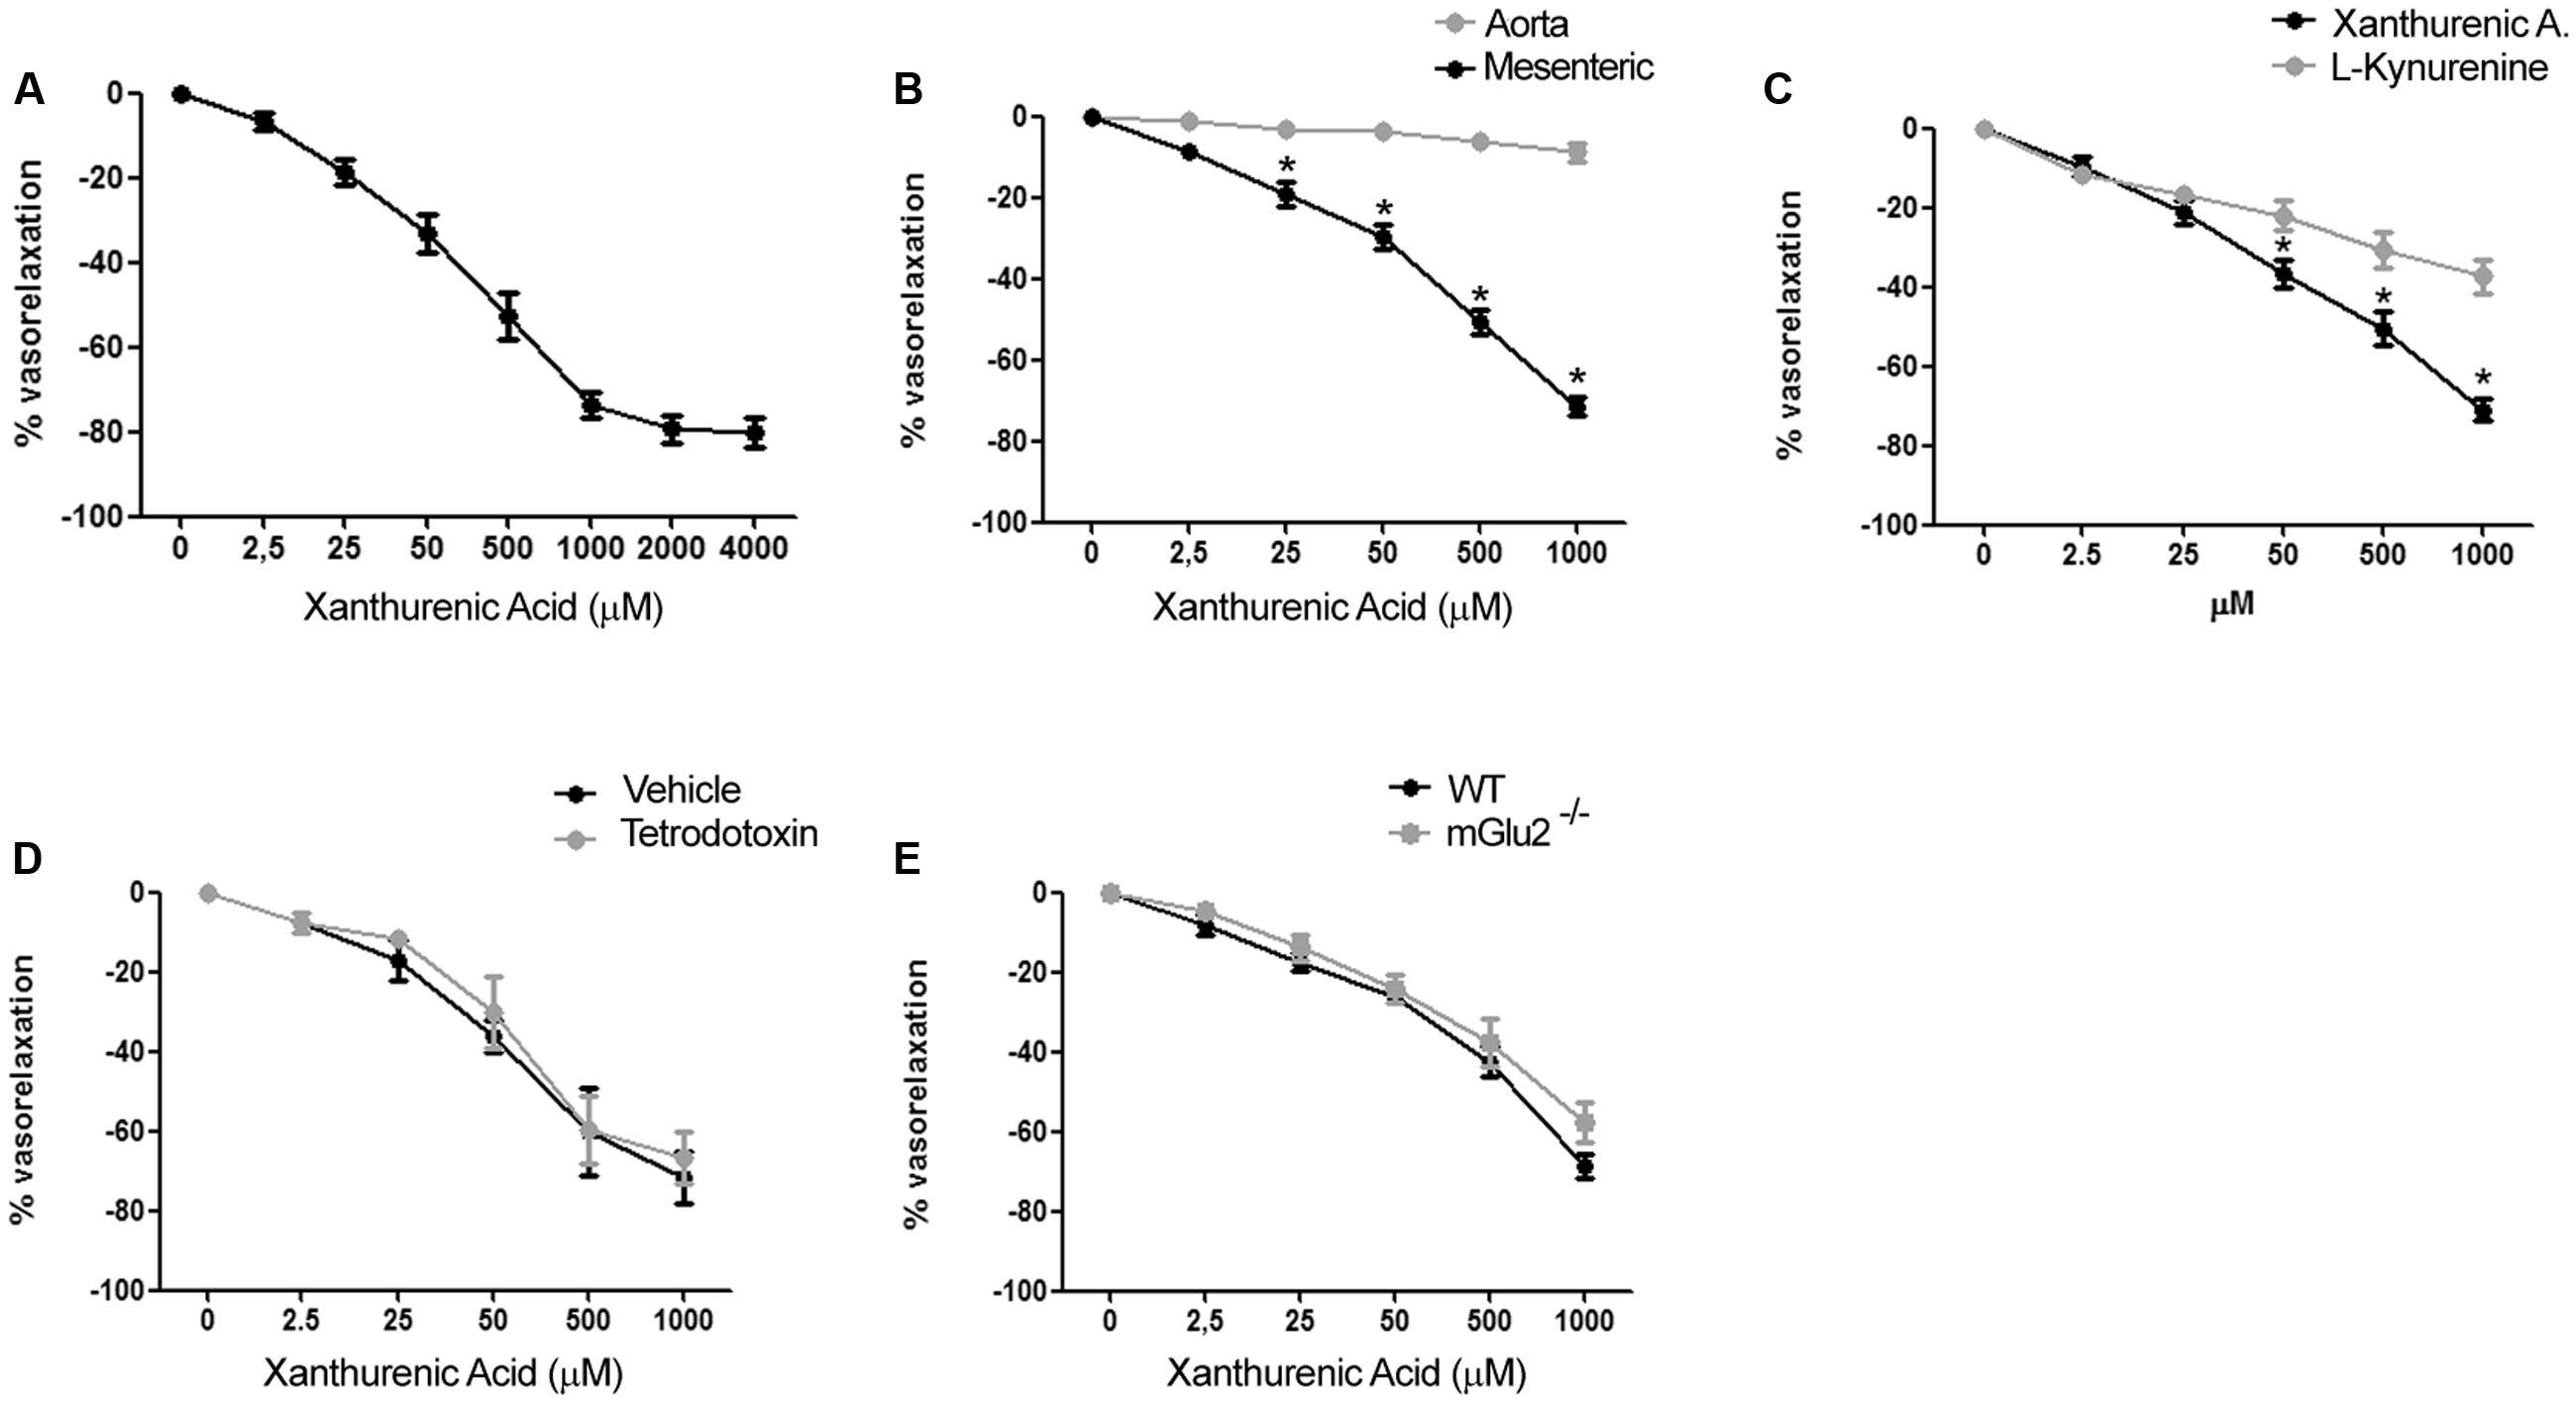 Frontiers Vasorelaxing Action Of The Kynurenine Metabolite Electrical Wiring Diagrams For Dummies 1700 2550